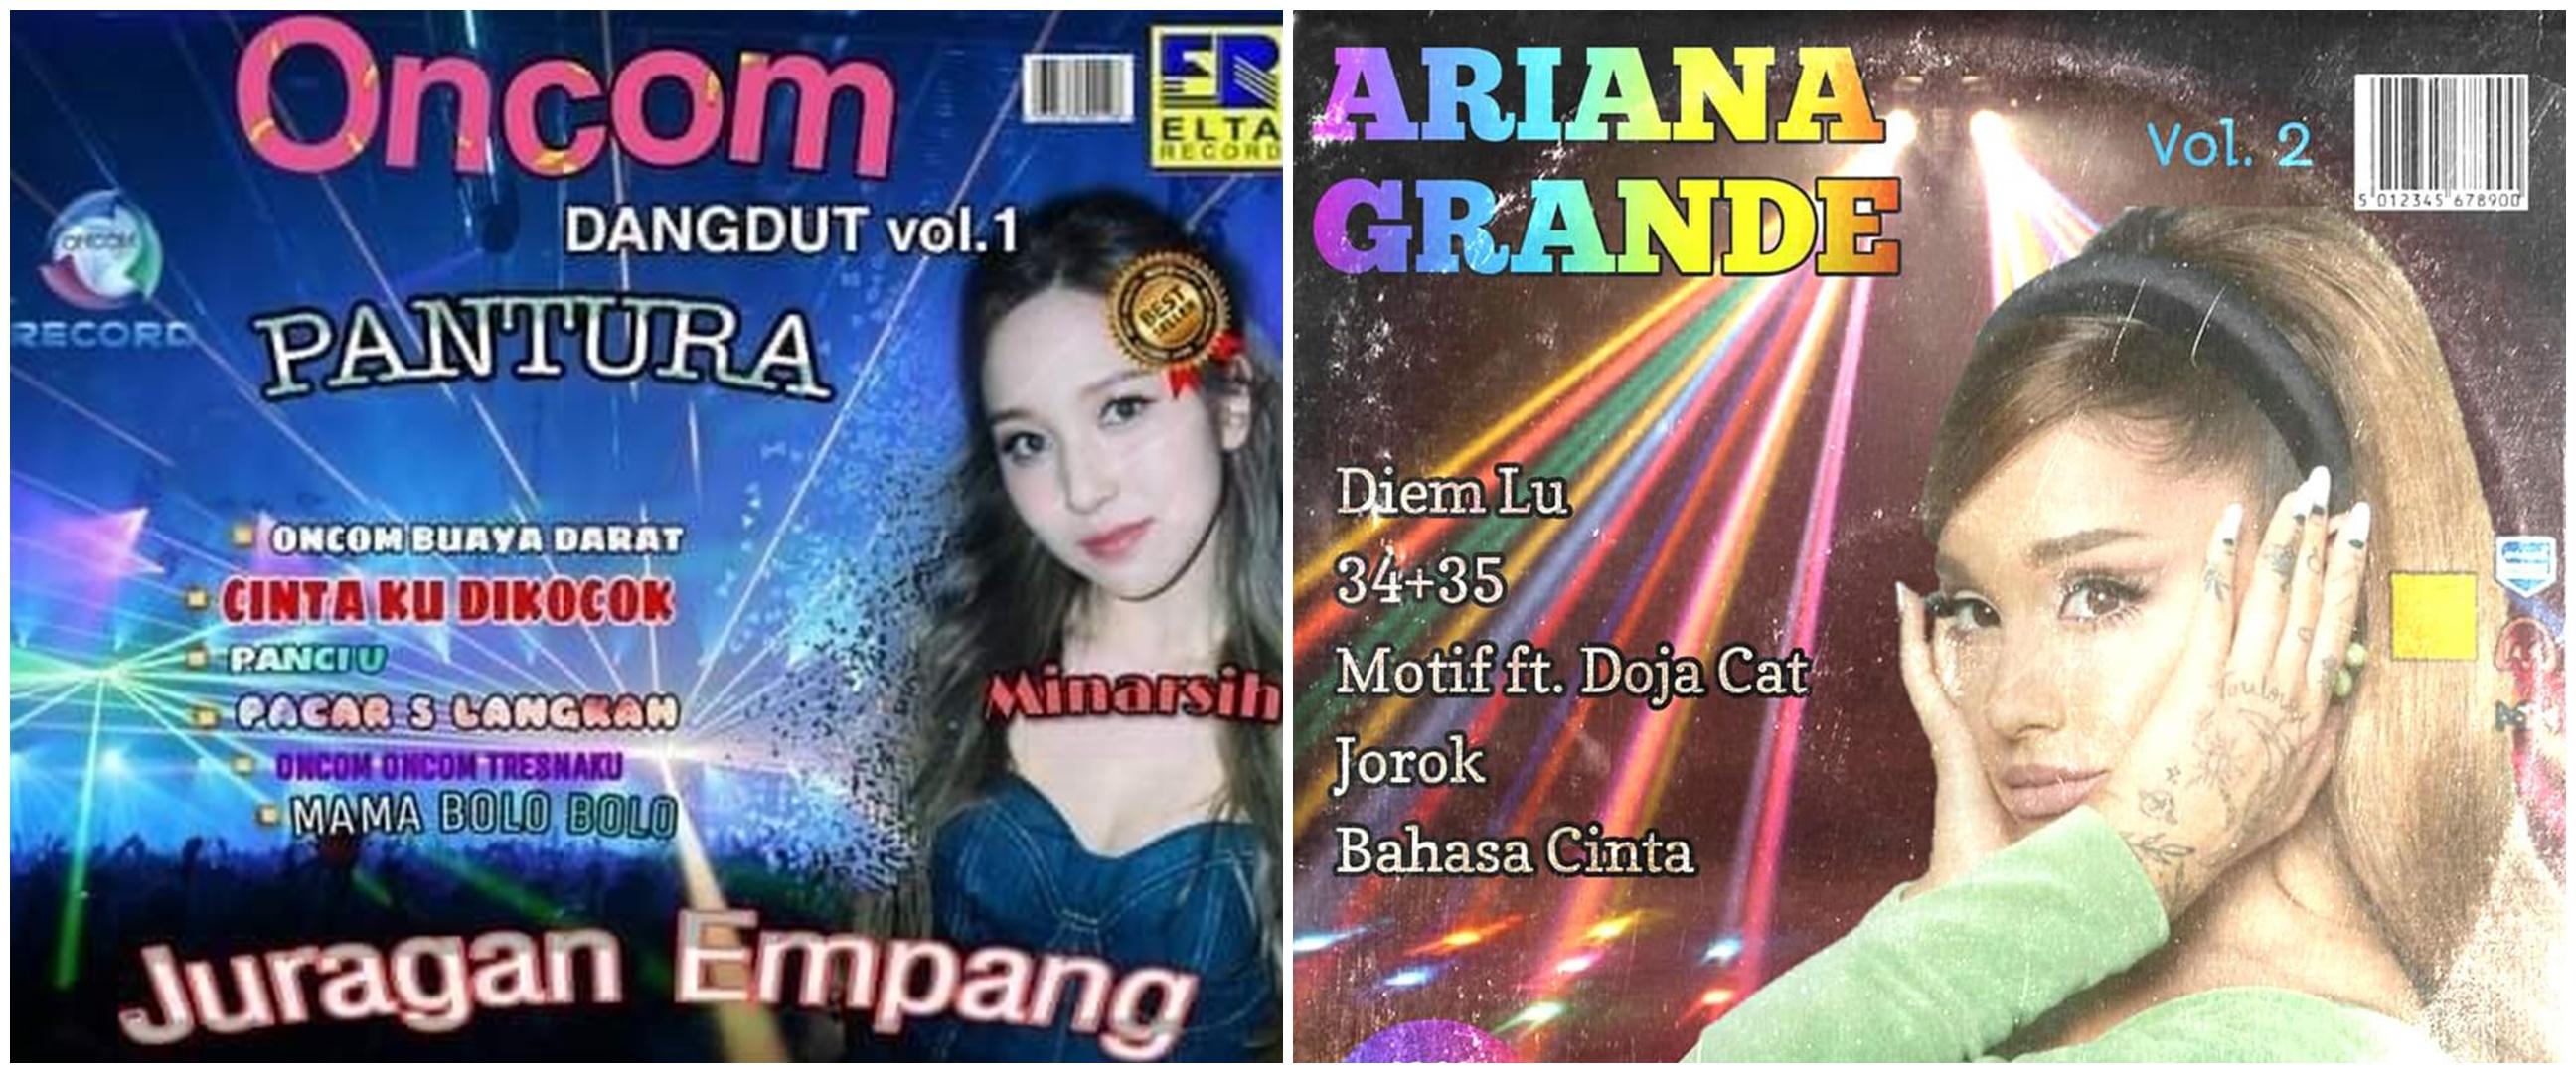 10 Editan cover album penyanyi luar negeri ini 'dangdut' abis